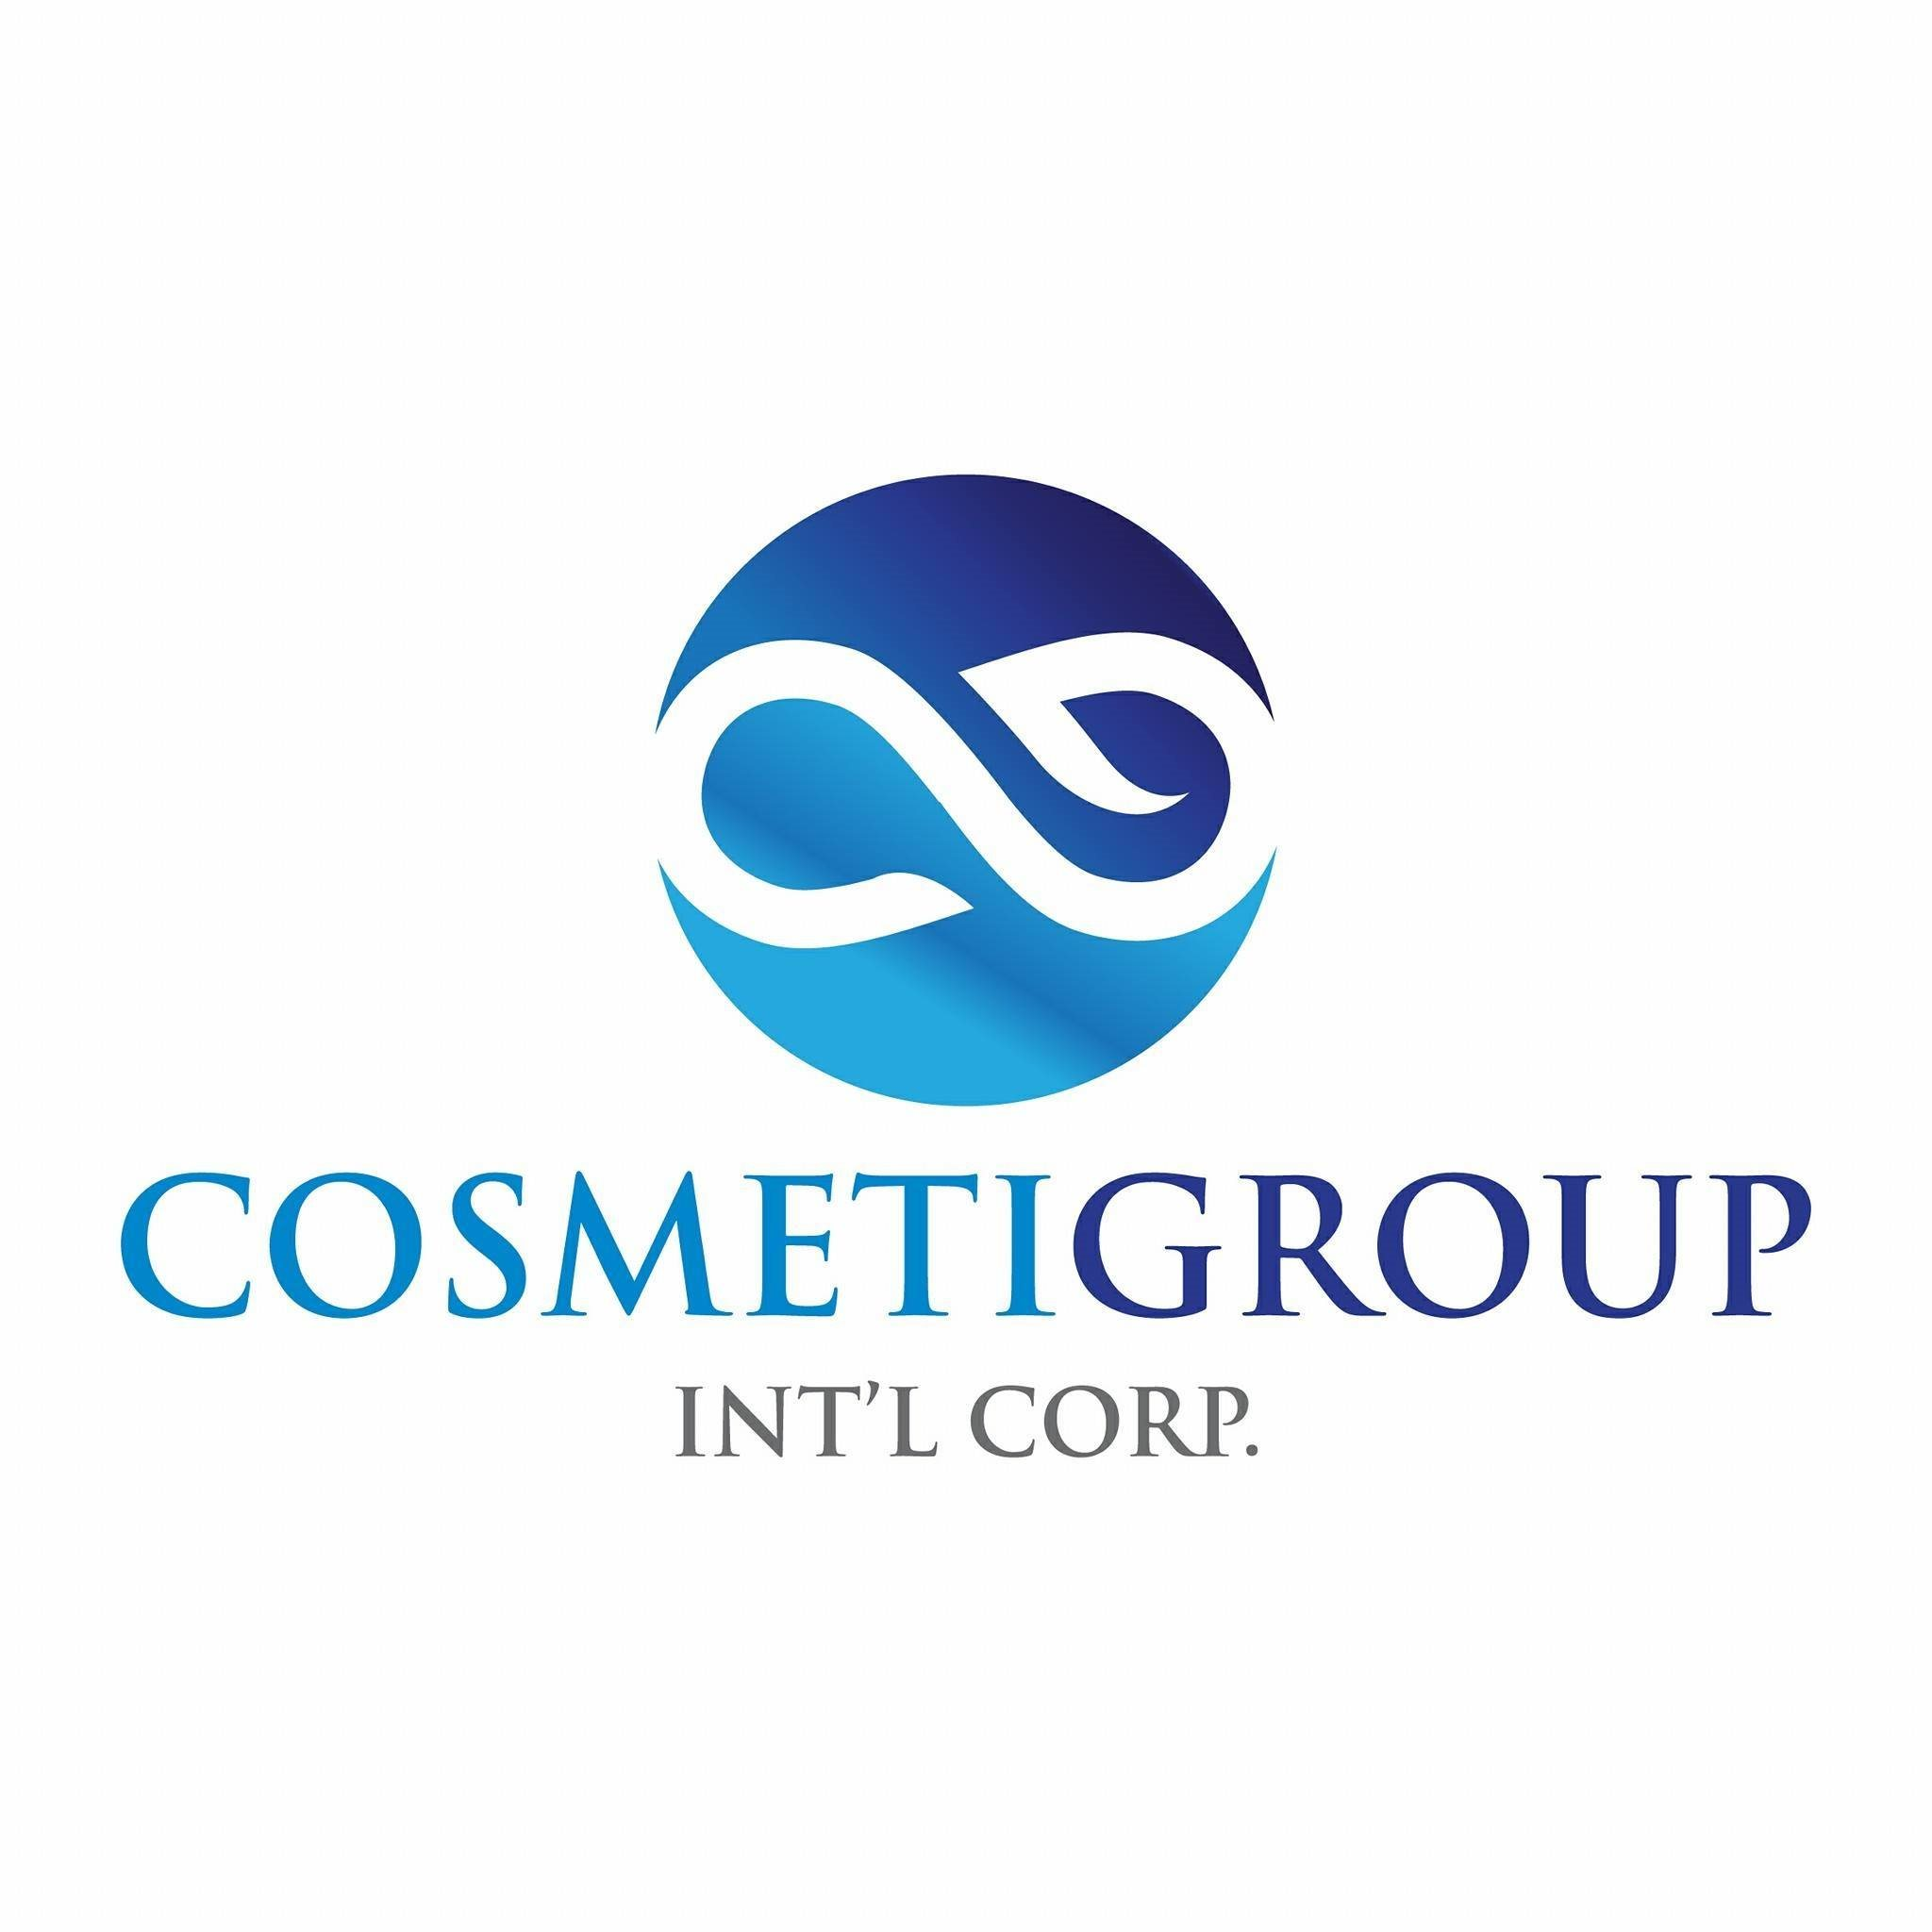 Cosmetigroup Int'l Corp.